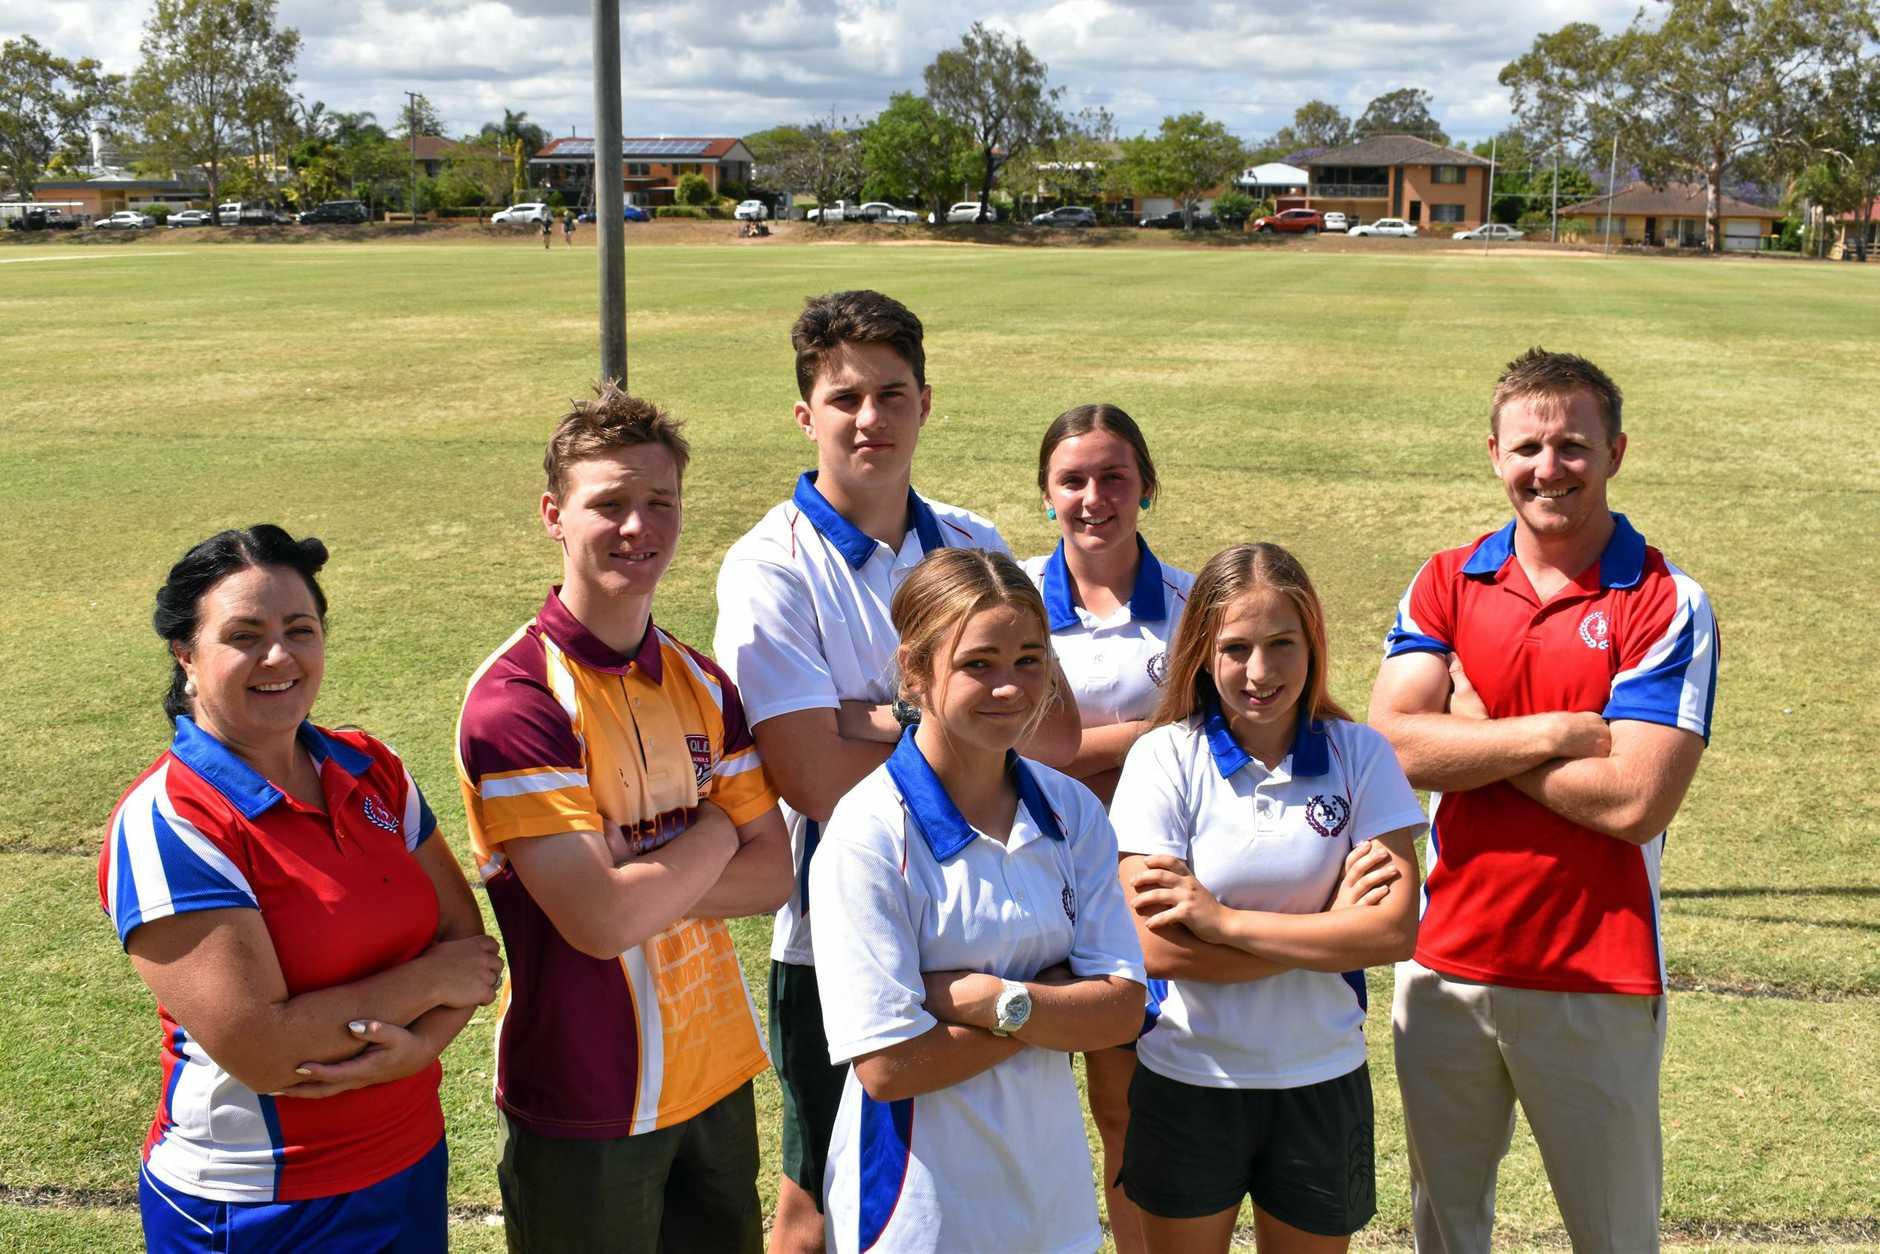 SUCCESSFUL YEAR: Lockyer District High School's Sarah Ryan, Dylan Flanagan, Nathan Kleidon, Kyha Black, Jess Fedrick, Matthew Schulze and Courtney Nolan.